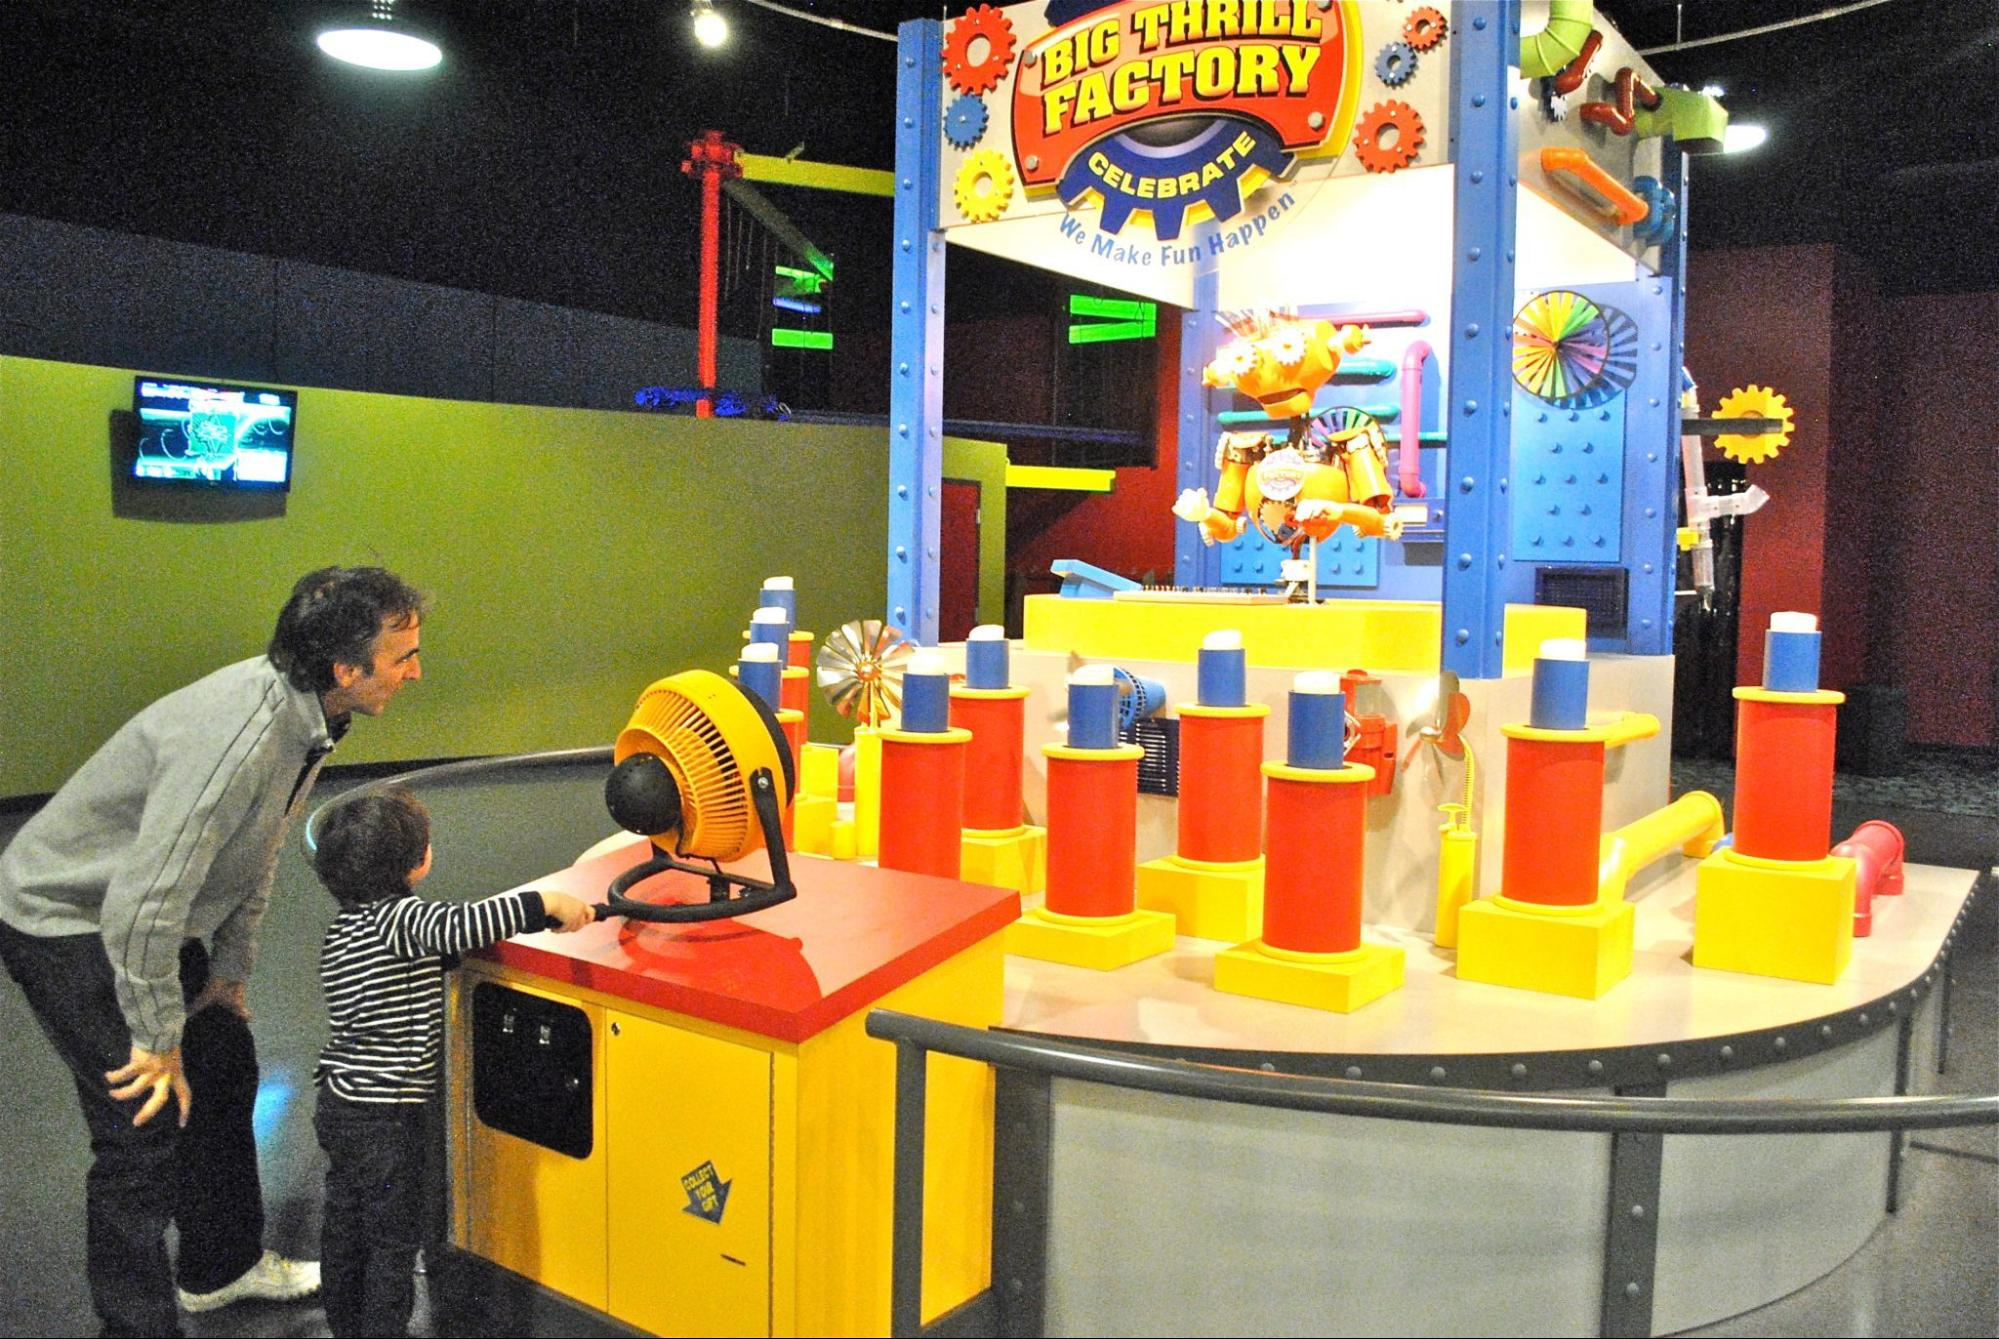 Big Thrill Factory Arcade